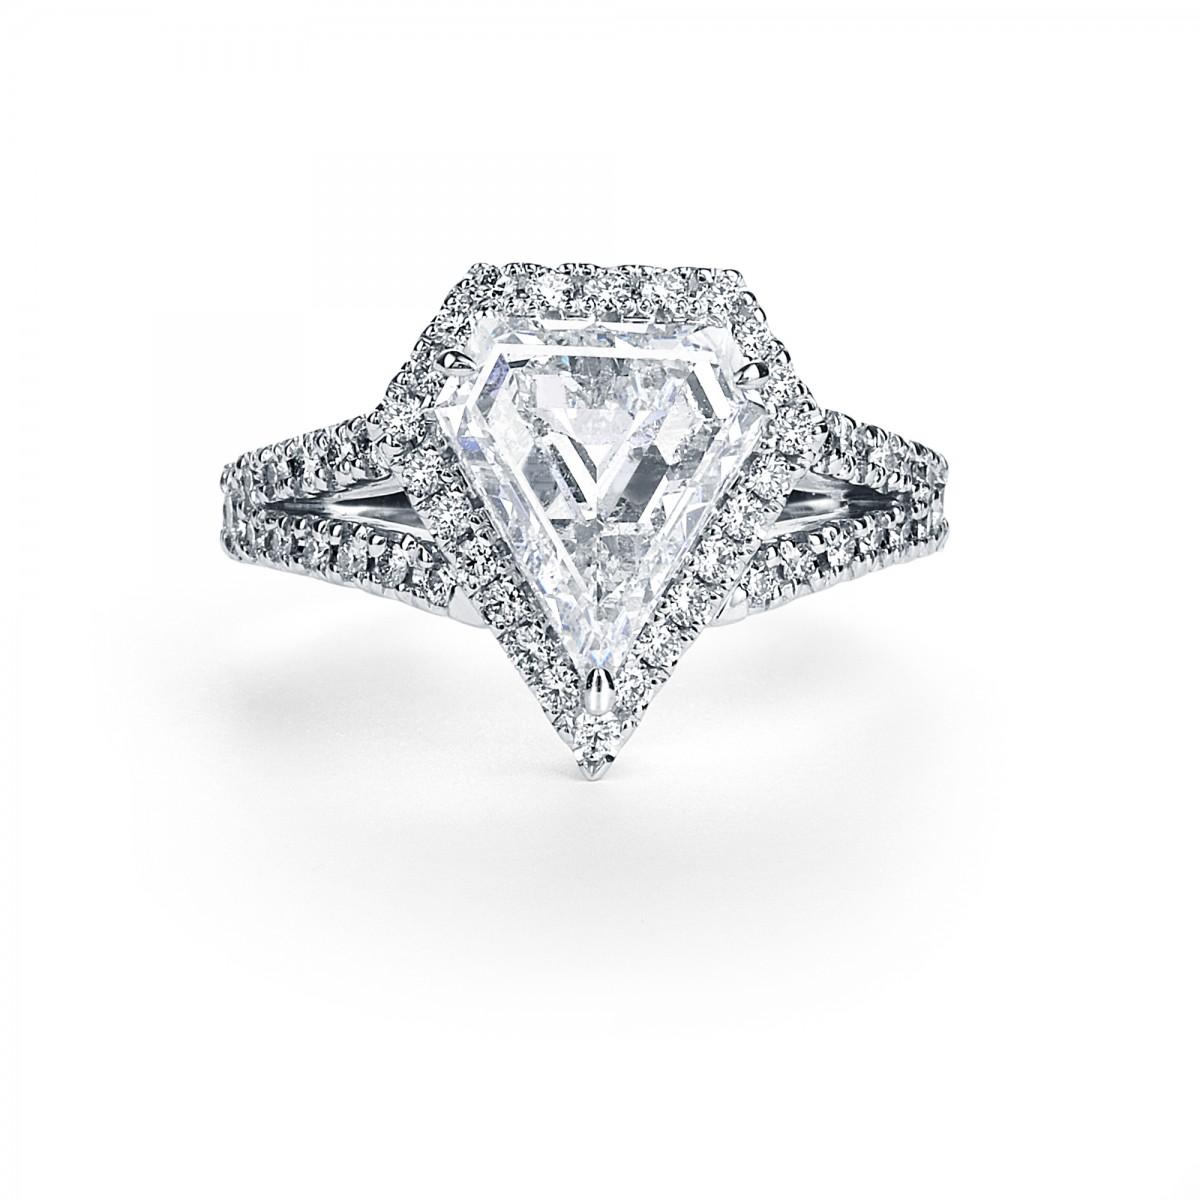 2ct Kite Shape Diamond Ring By Mark Hiroshi Willis